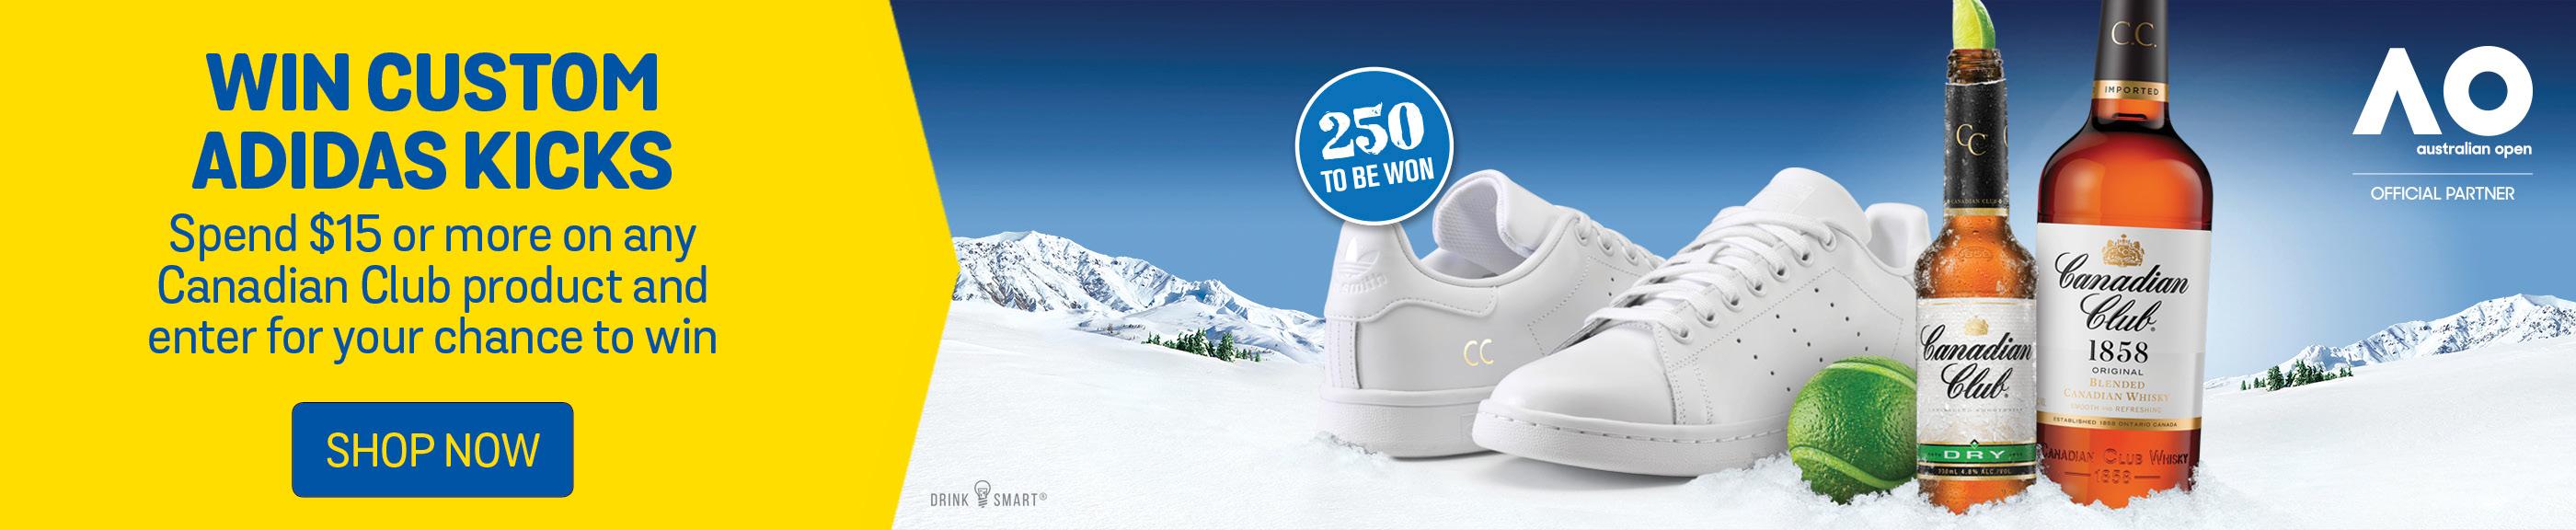 Win Custom Adidas Kicks